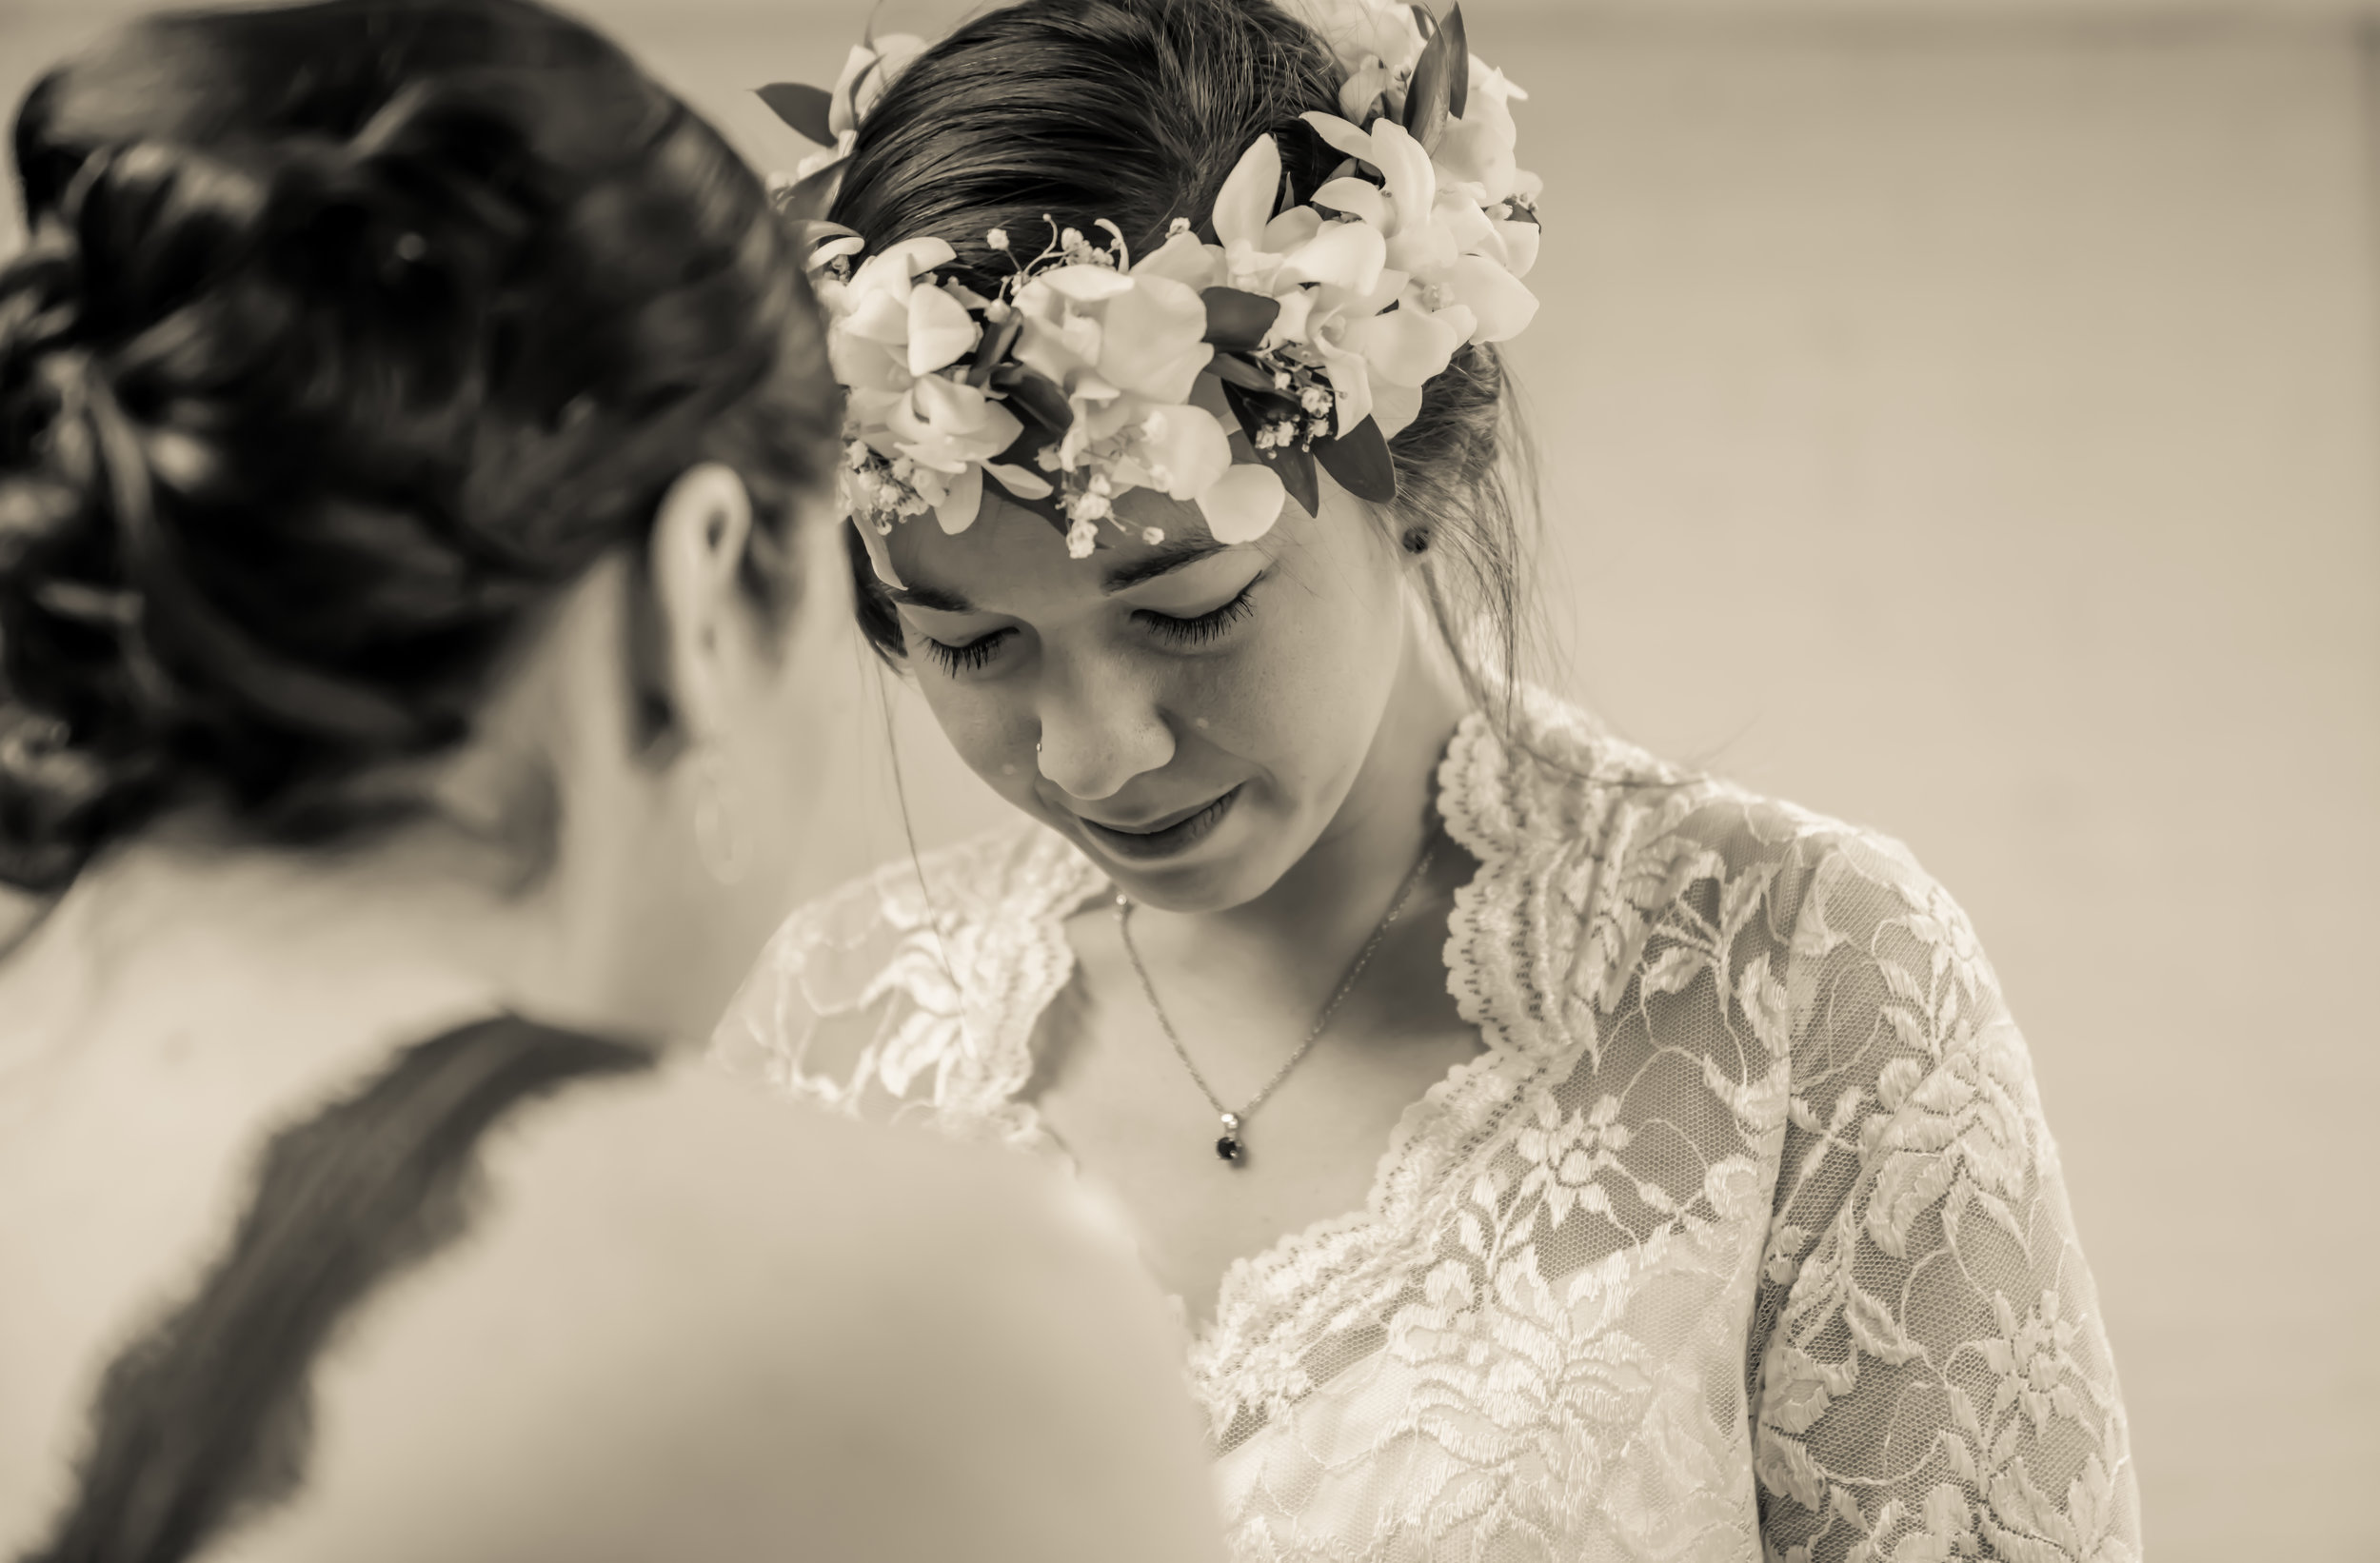 Bridal portrait field photo louisville photographer